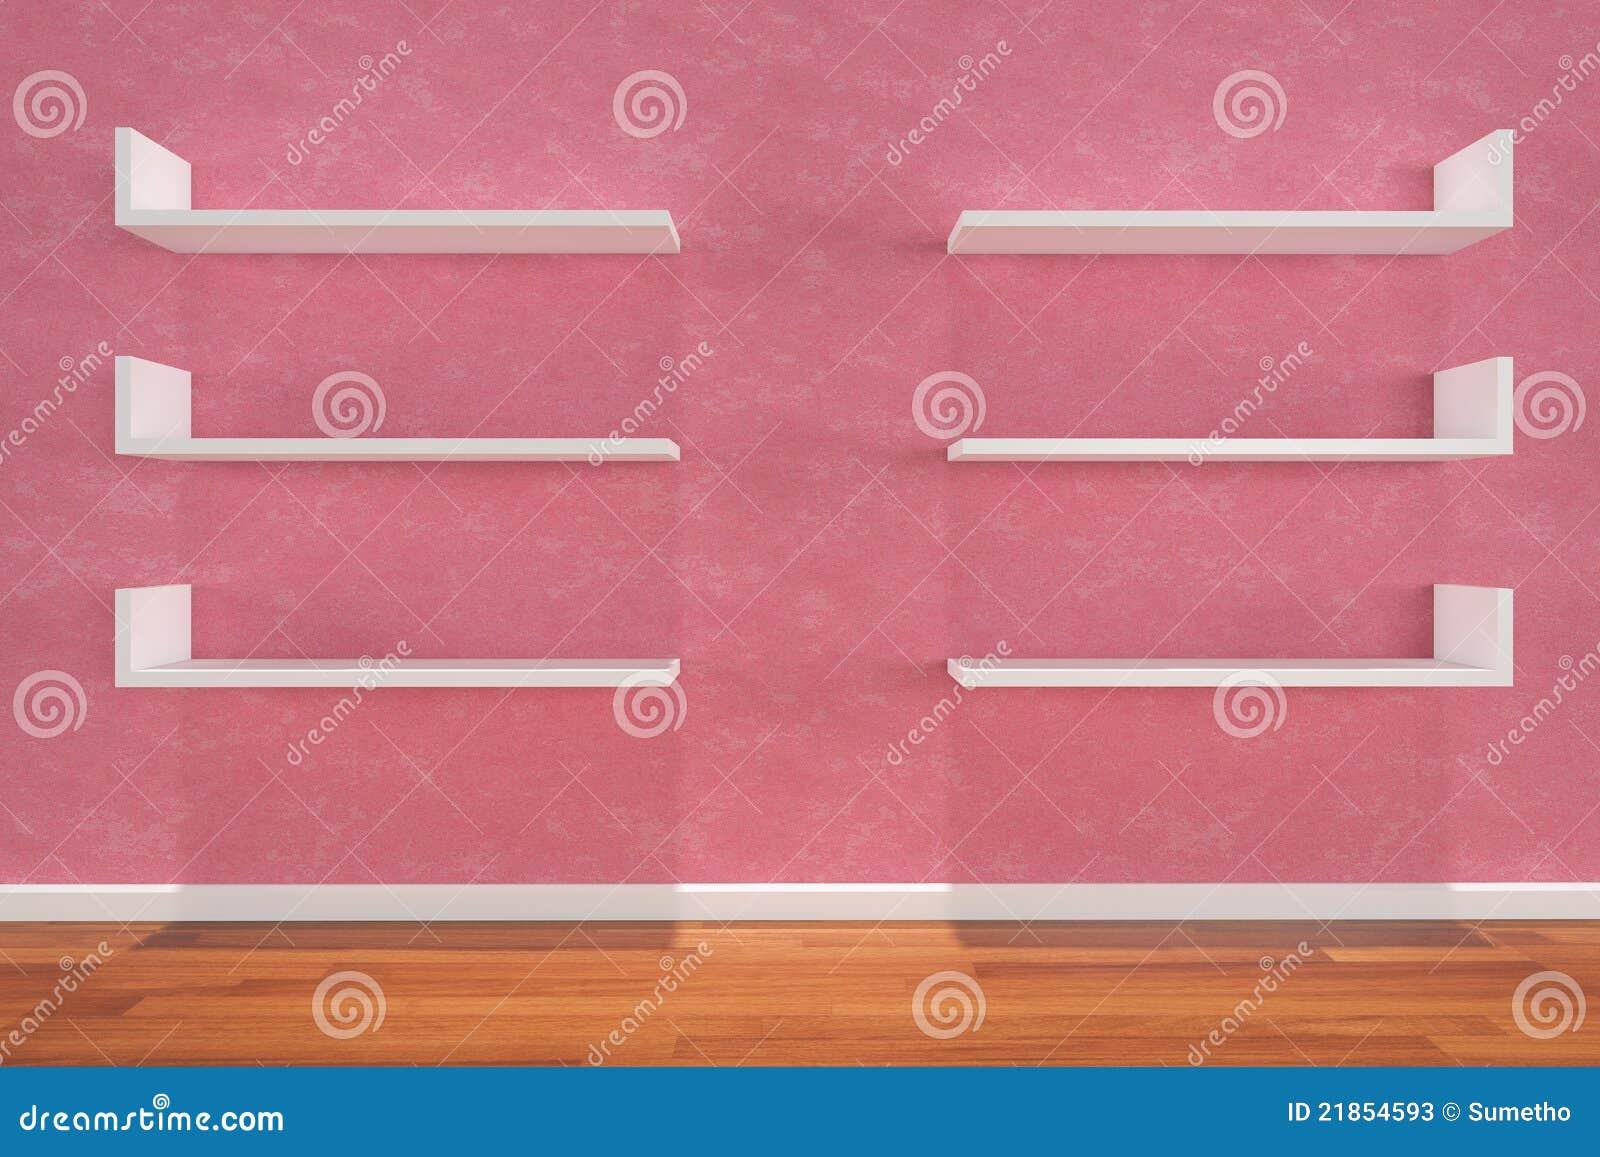 Prateleiras Na Parede Cor de rosa Fotos de Stock Imagem: 21854593 #83AA21 1300x957